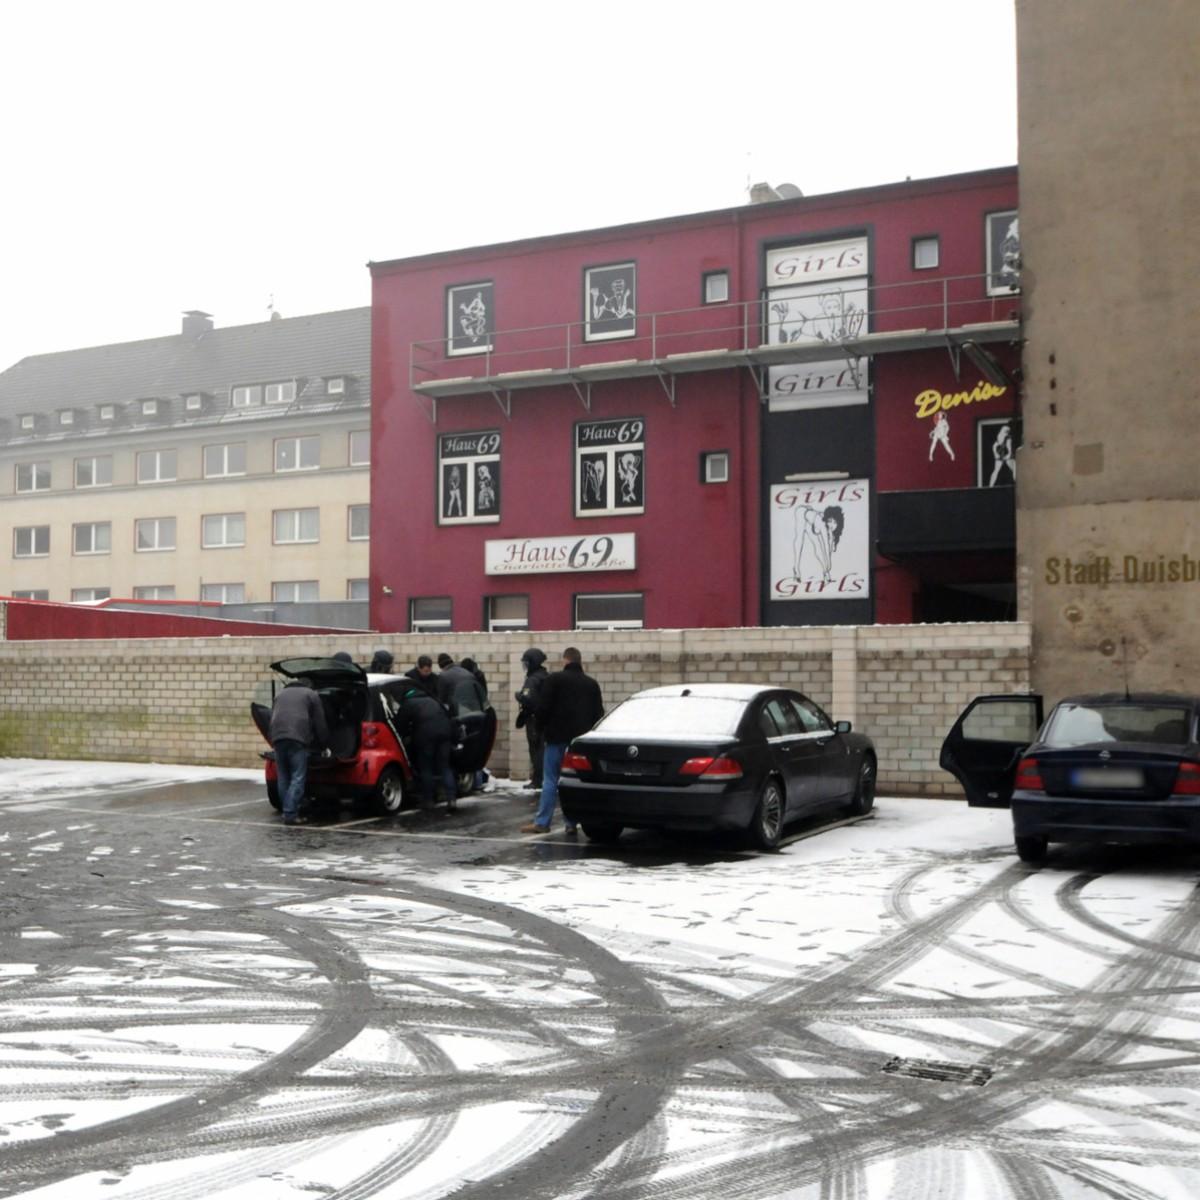 Duisburg eros Flasshofstrasse girls